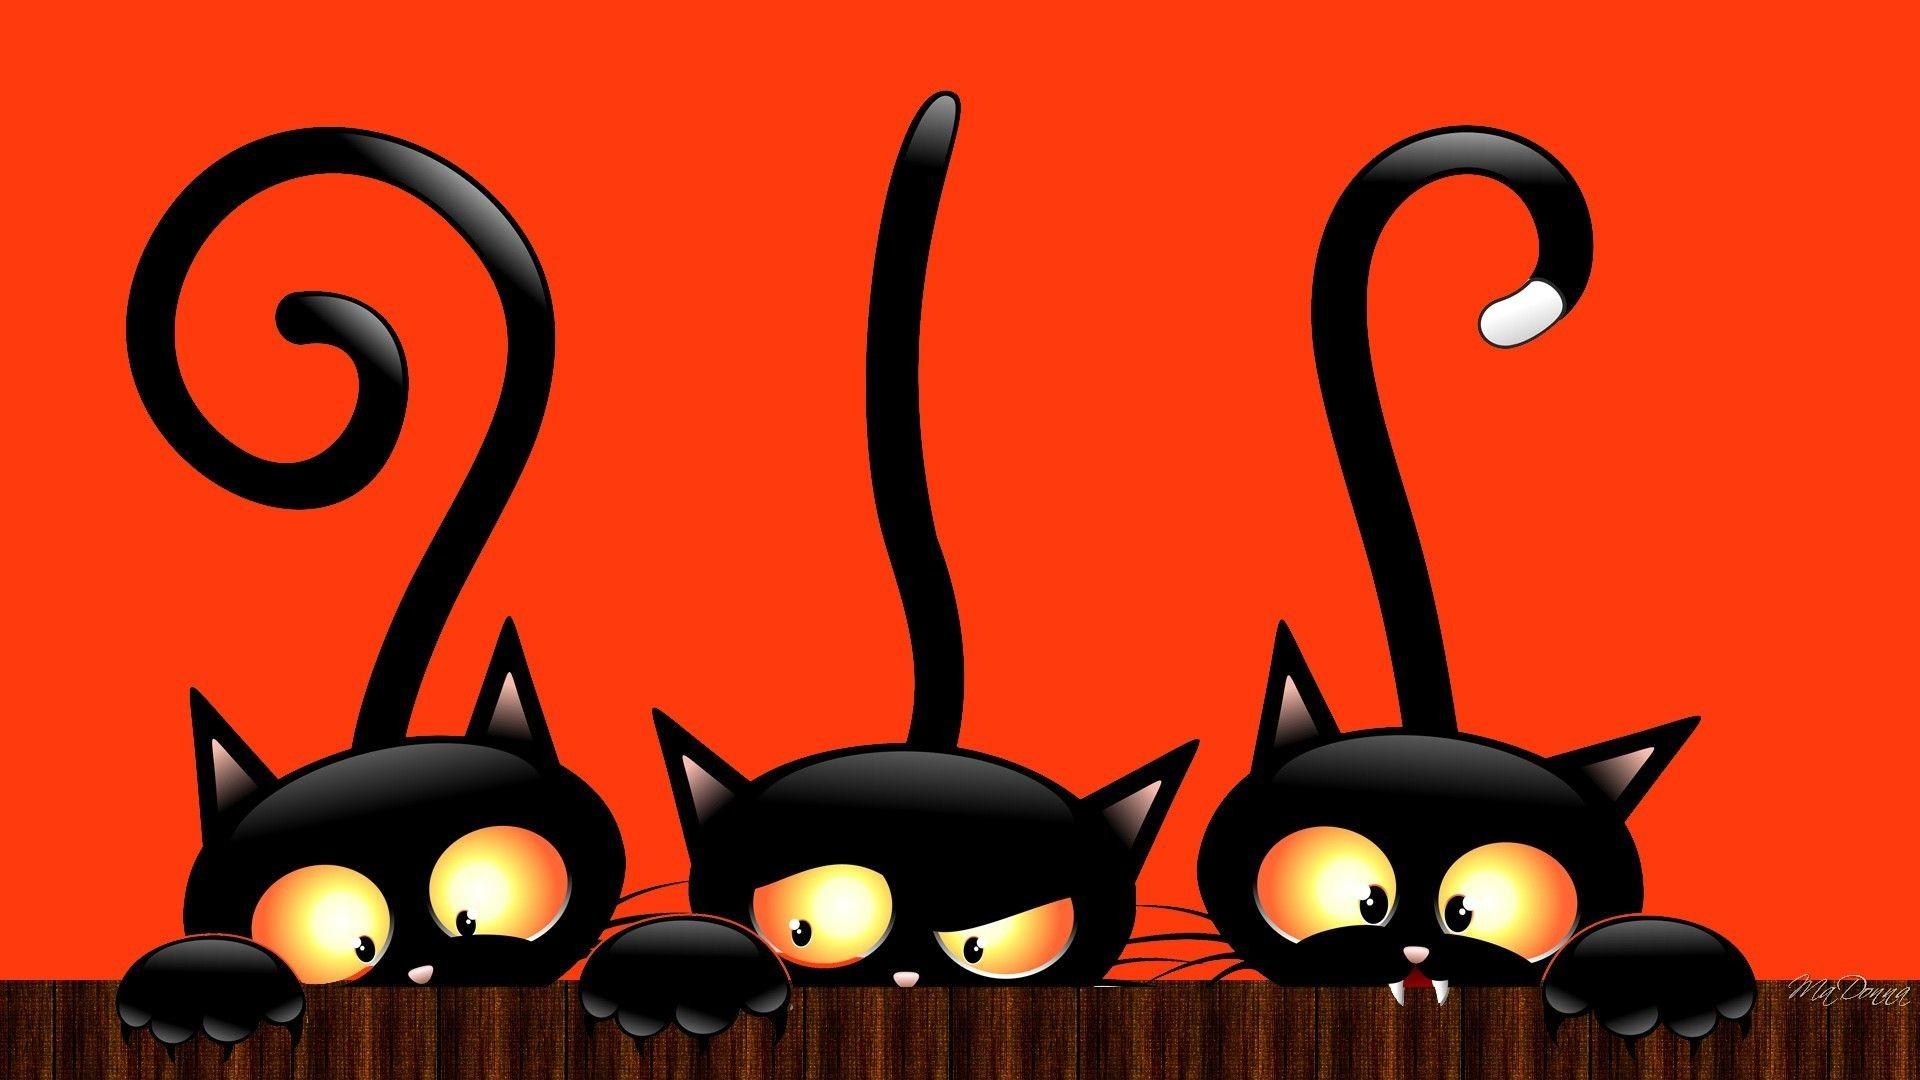 Res: 1920x1080, Happy Halloween cat